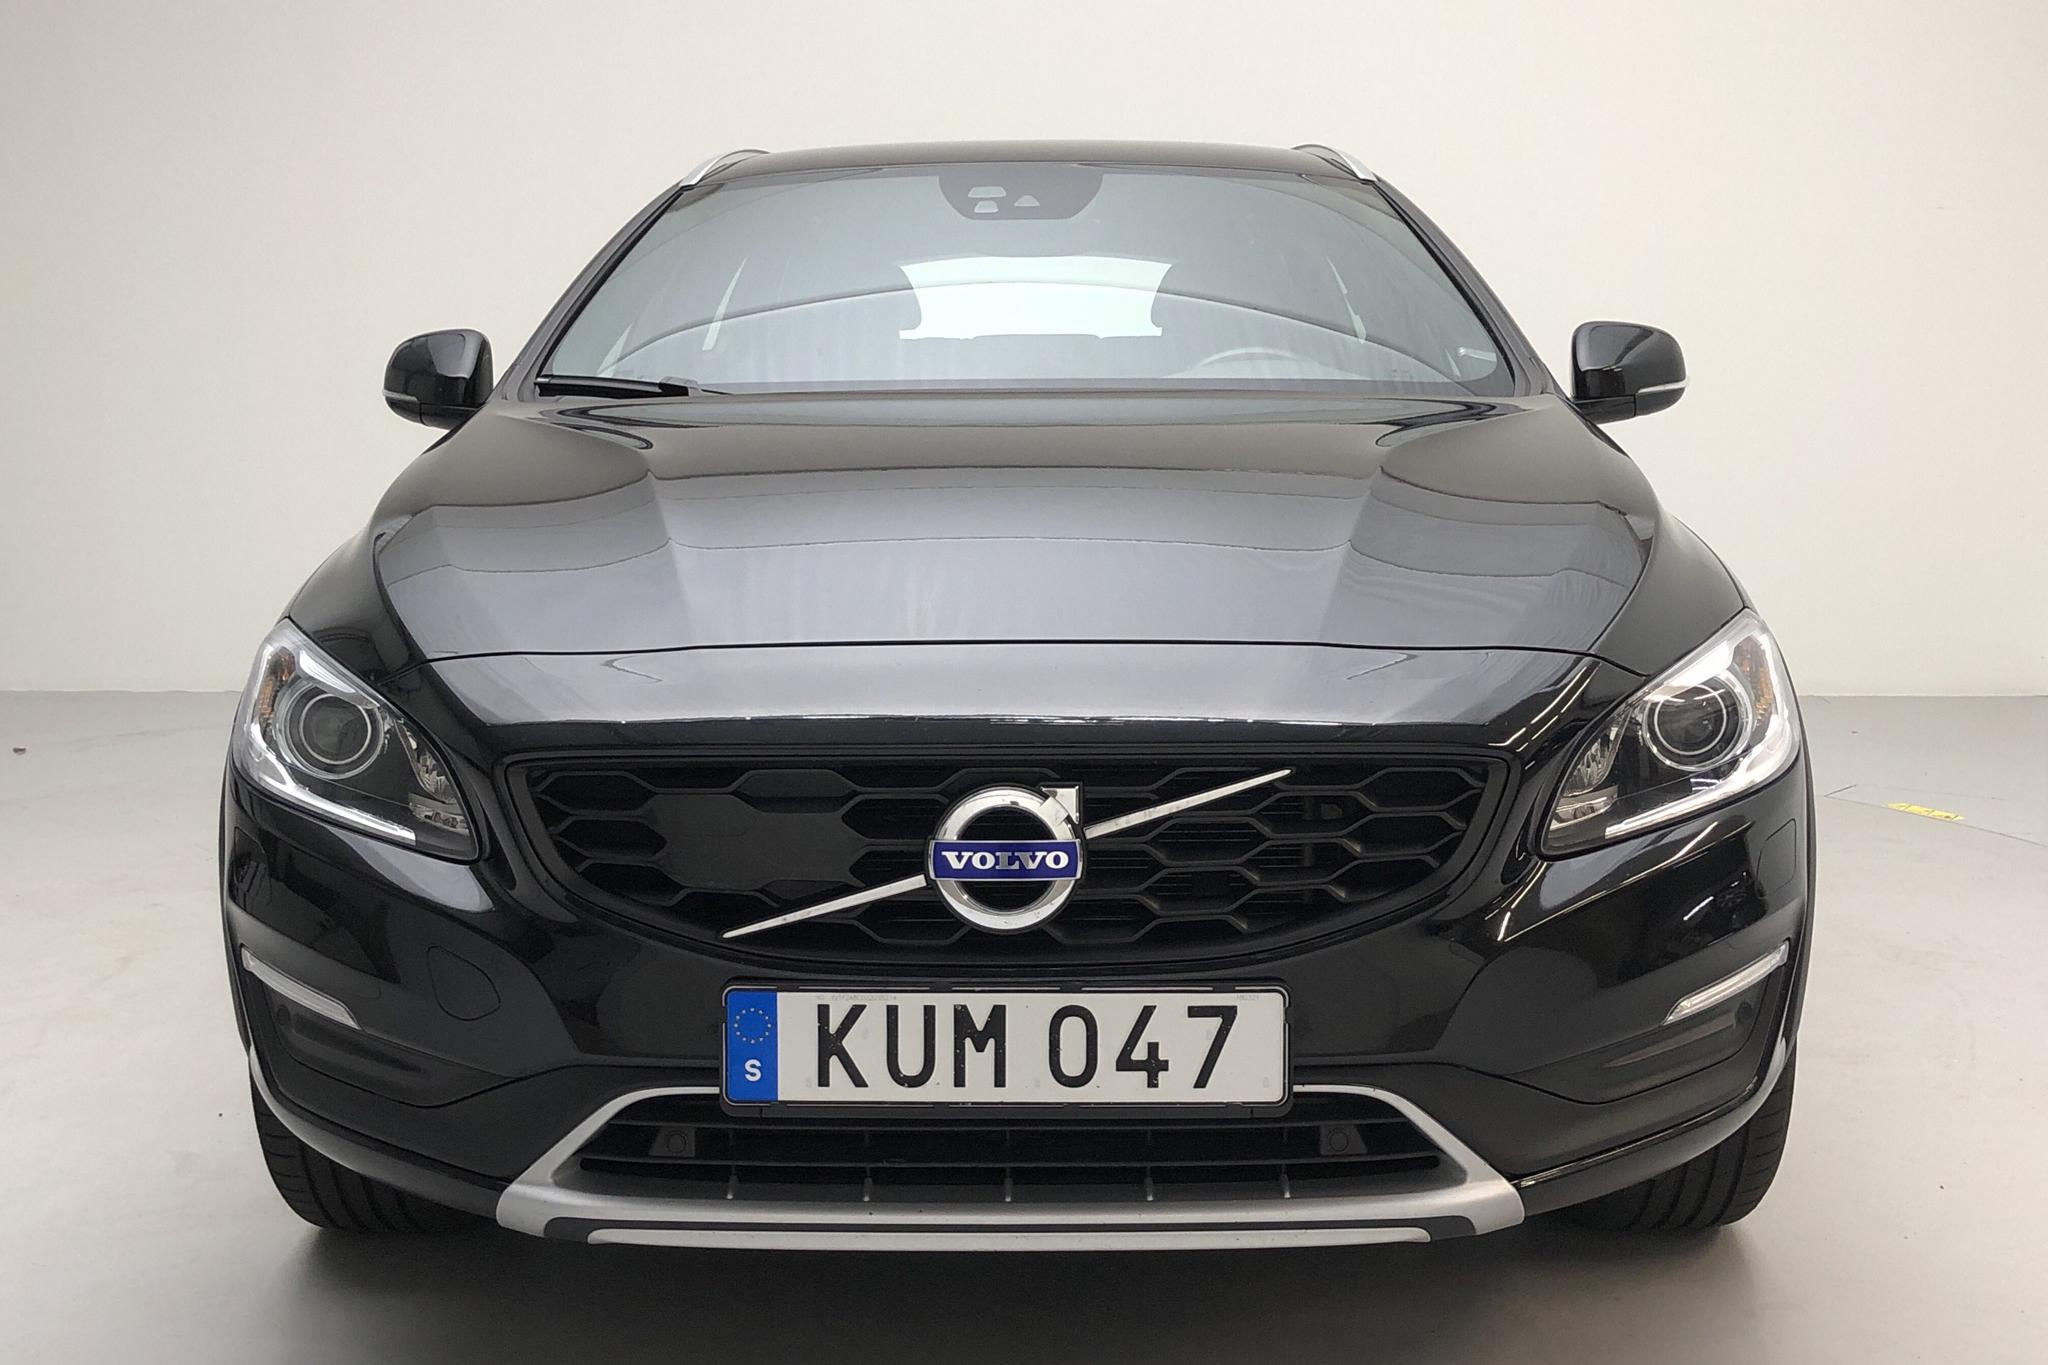 Volvo V60 D4 Cross Country (190hk) - 9 084 mil - Automat - svart - 2018